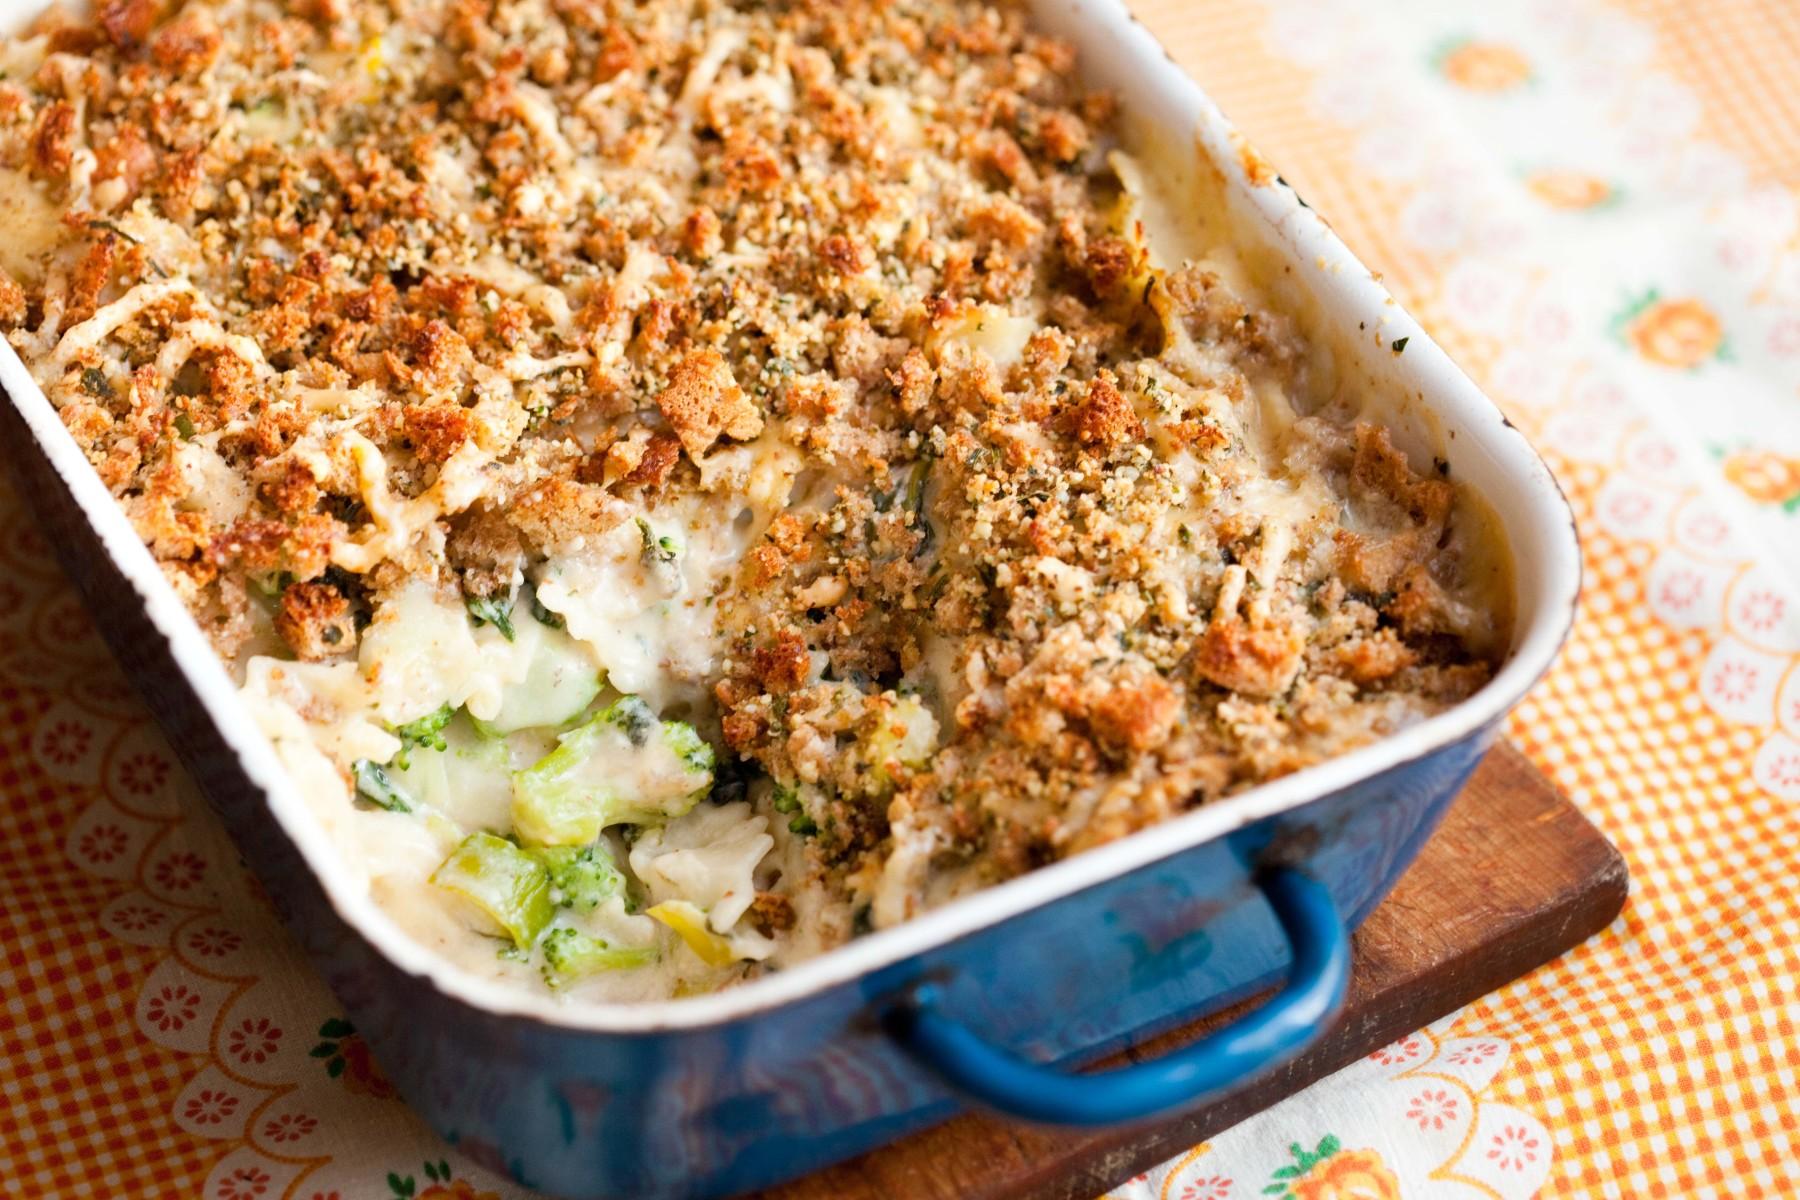 makaronowa-zapiekanka-ze-szpinakiem-i-brokulami